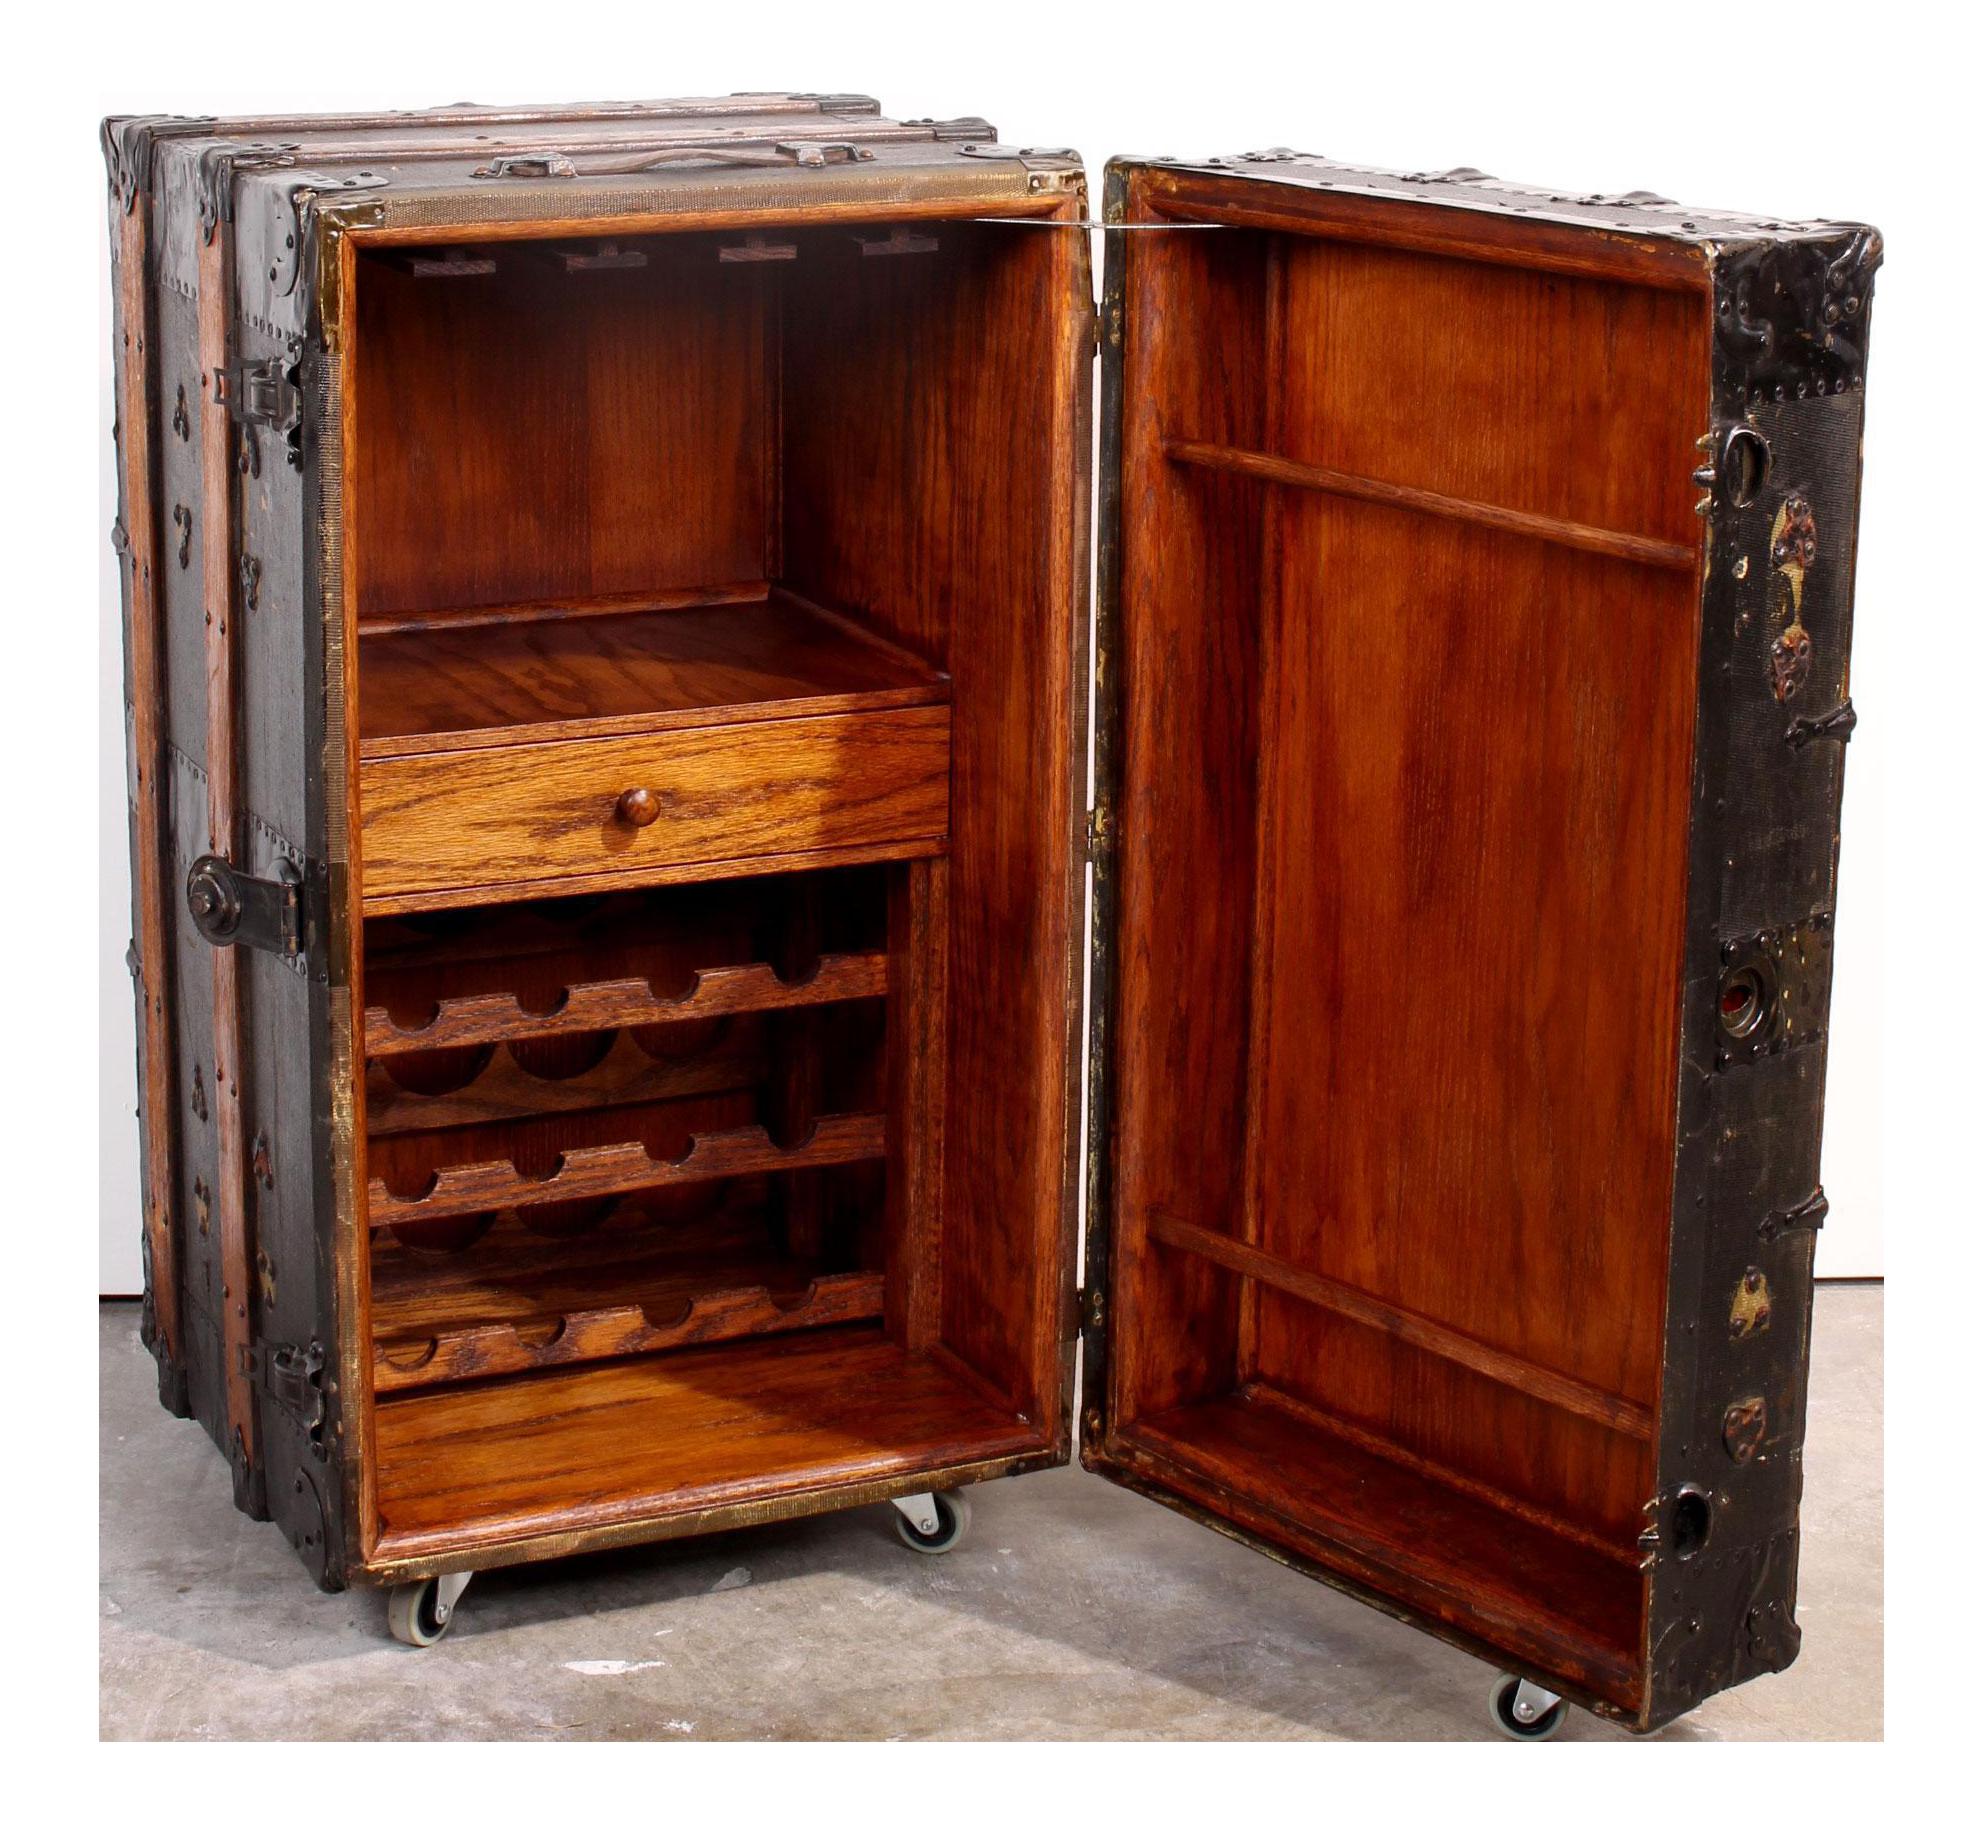 Cabinet hardware pulls 100 kitchen cabinet knobs pull u2014 modern home interiors broyhill - Contemporary cabinet knobs wine locker ...